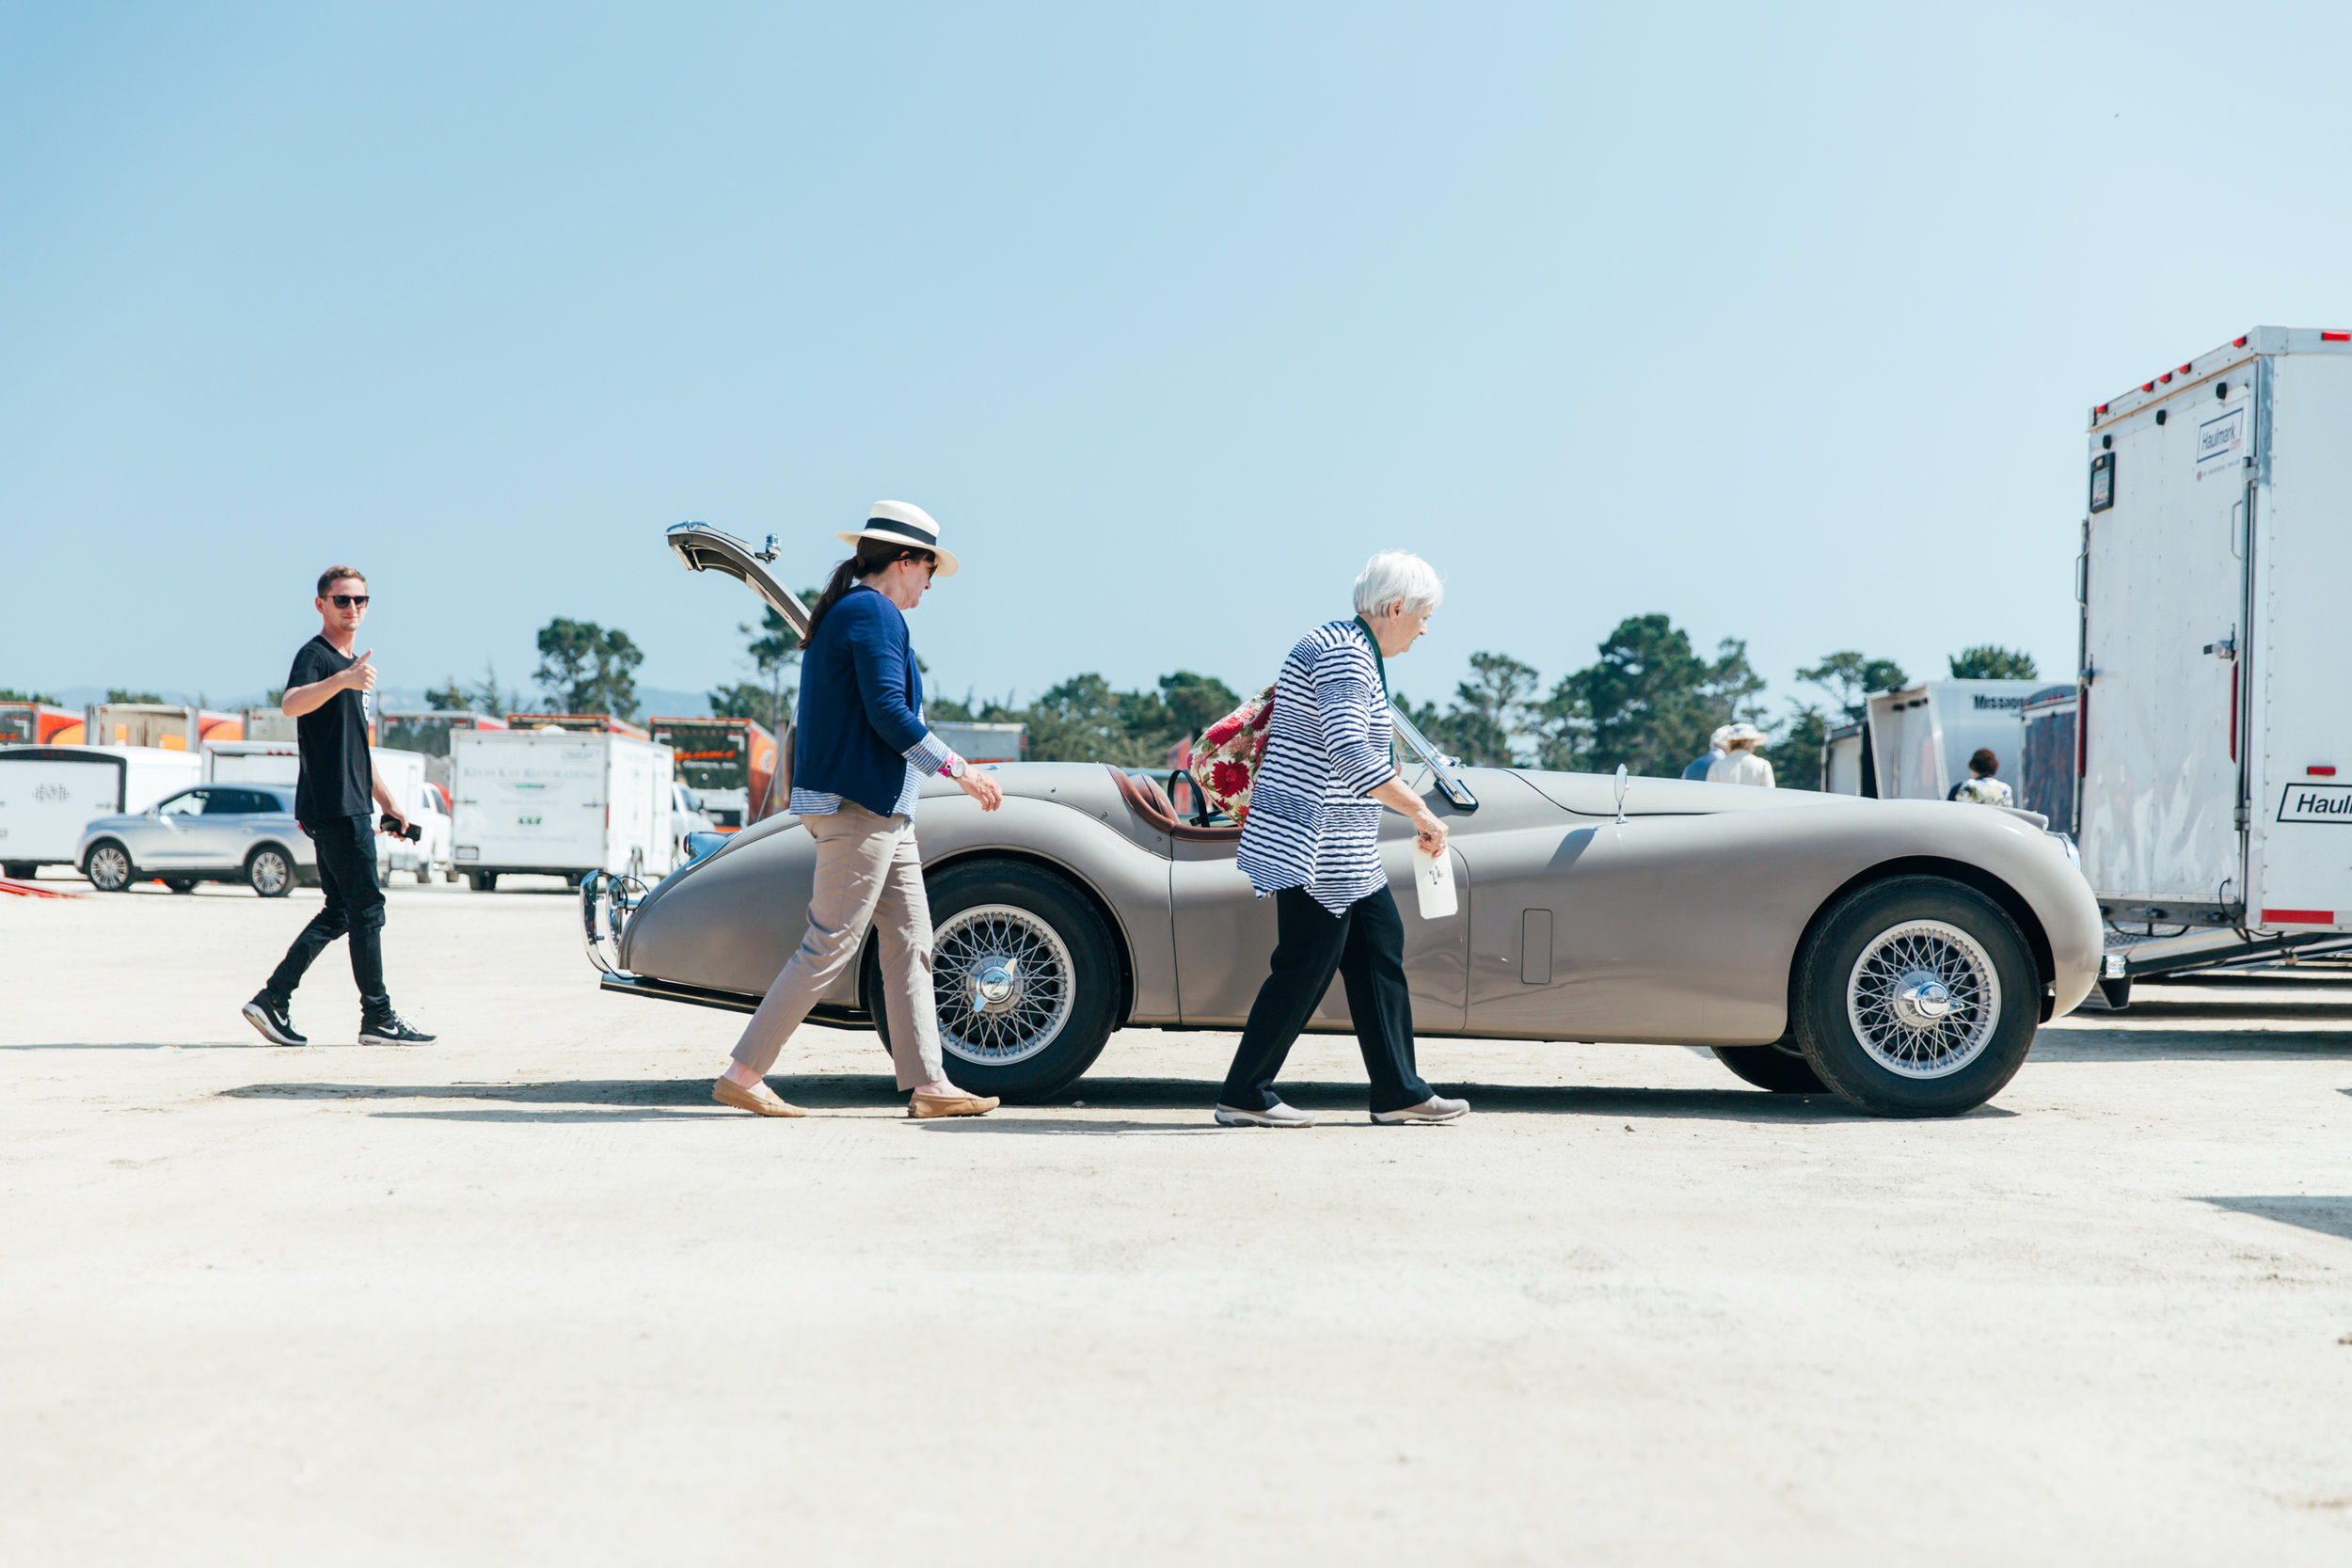 Stay_Driven_Monterey_Car_Week_5-3.jpg